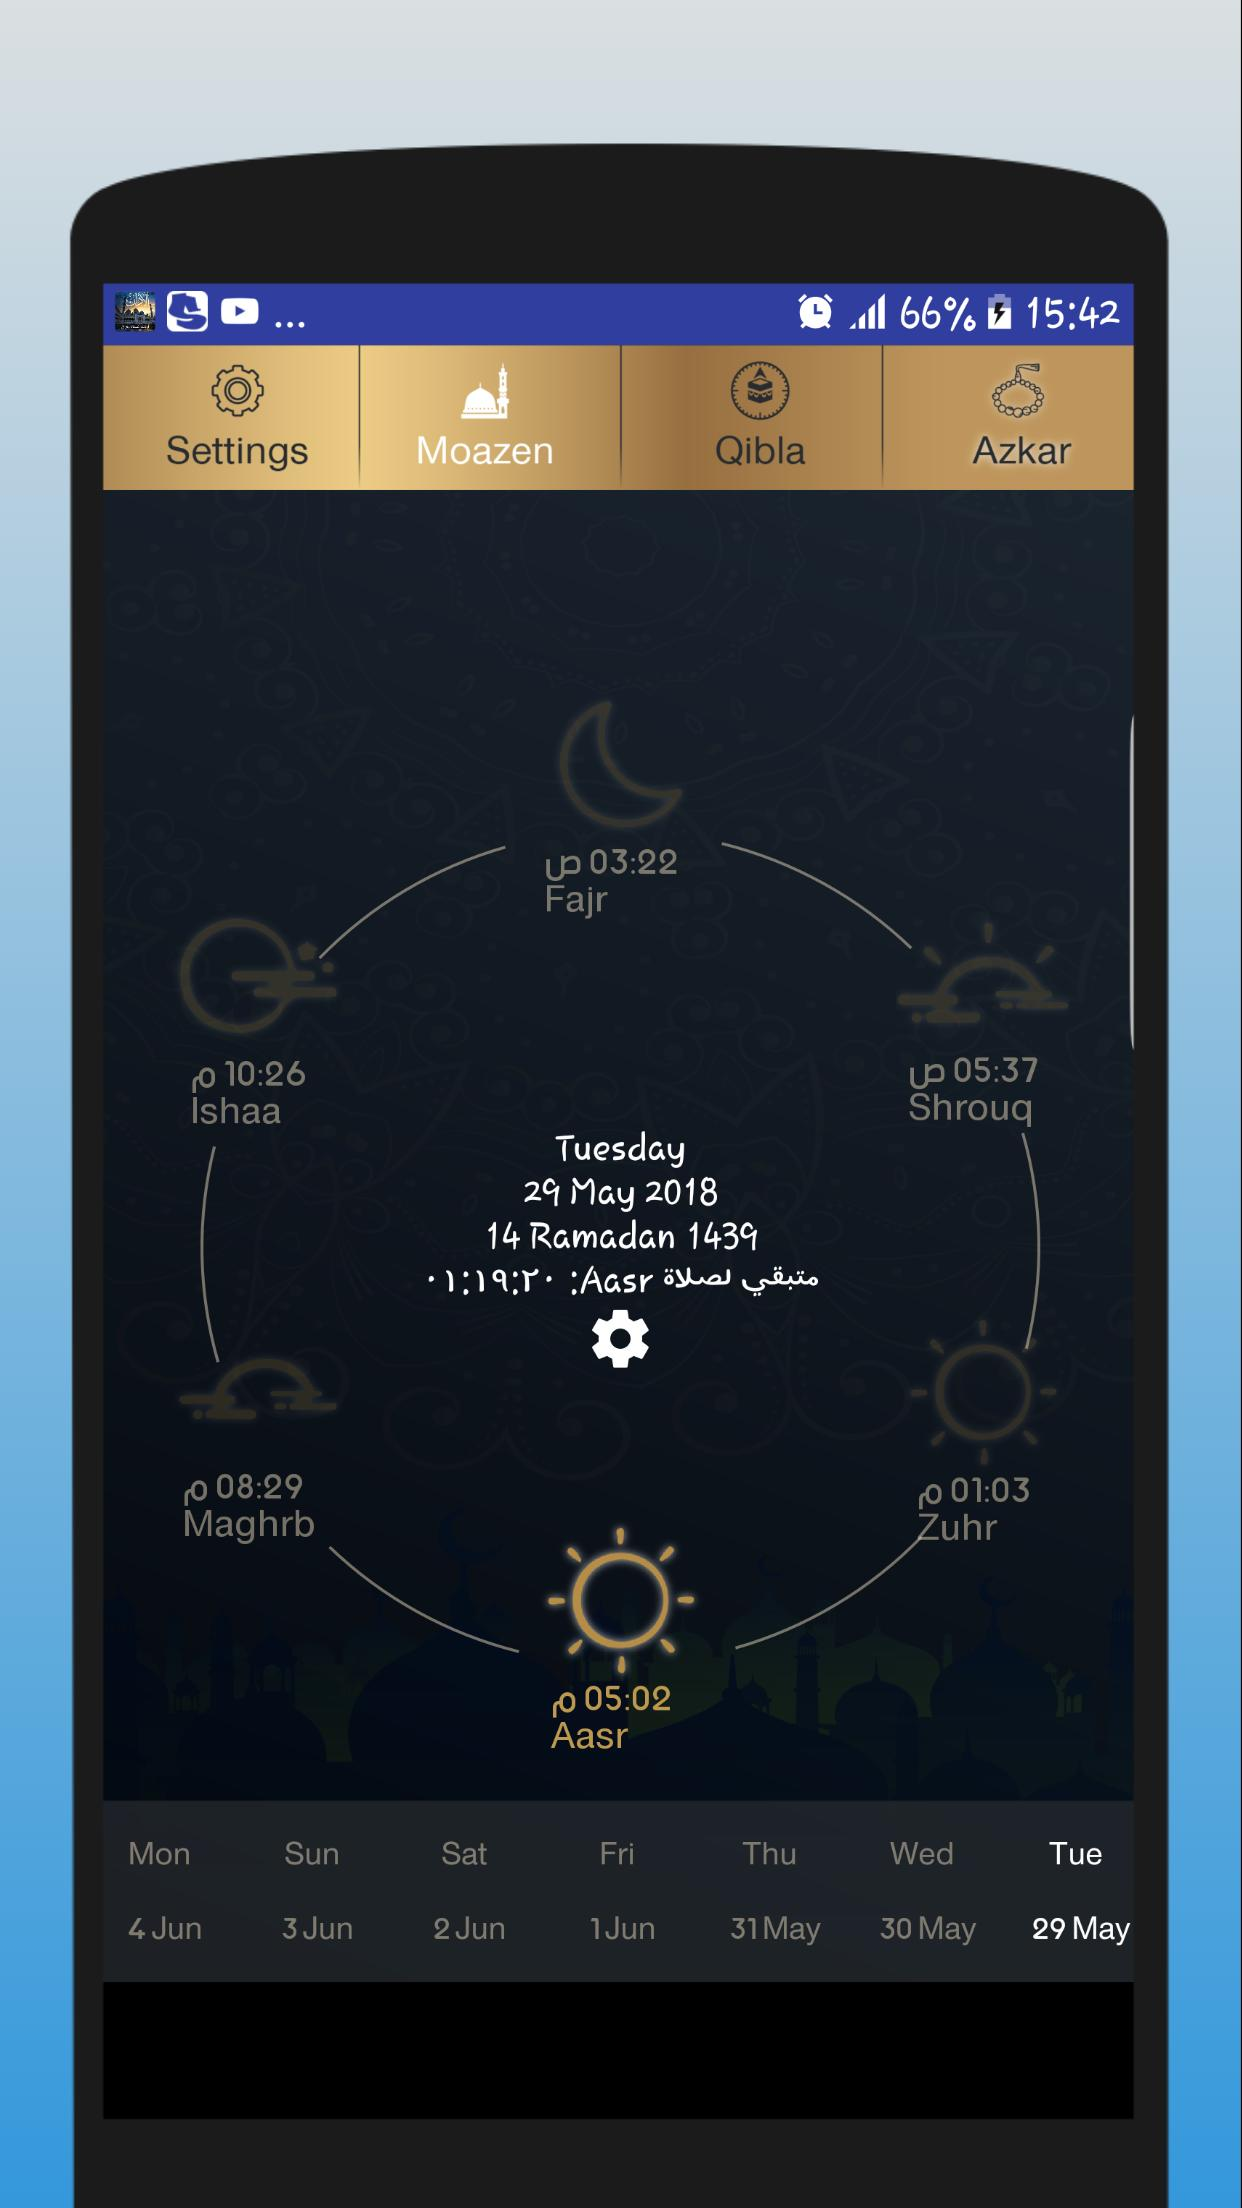 Horaires de prière , Athan , Quibla , Adkar for Android